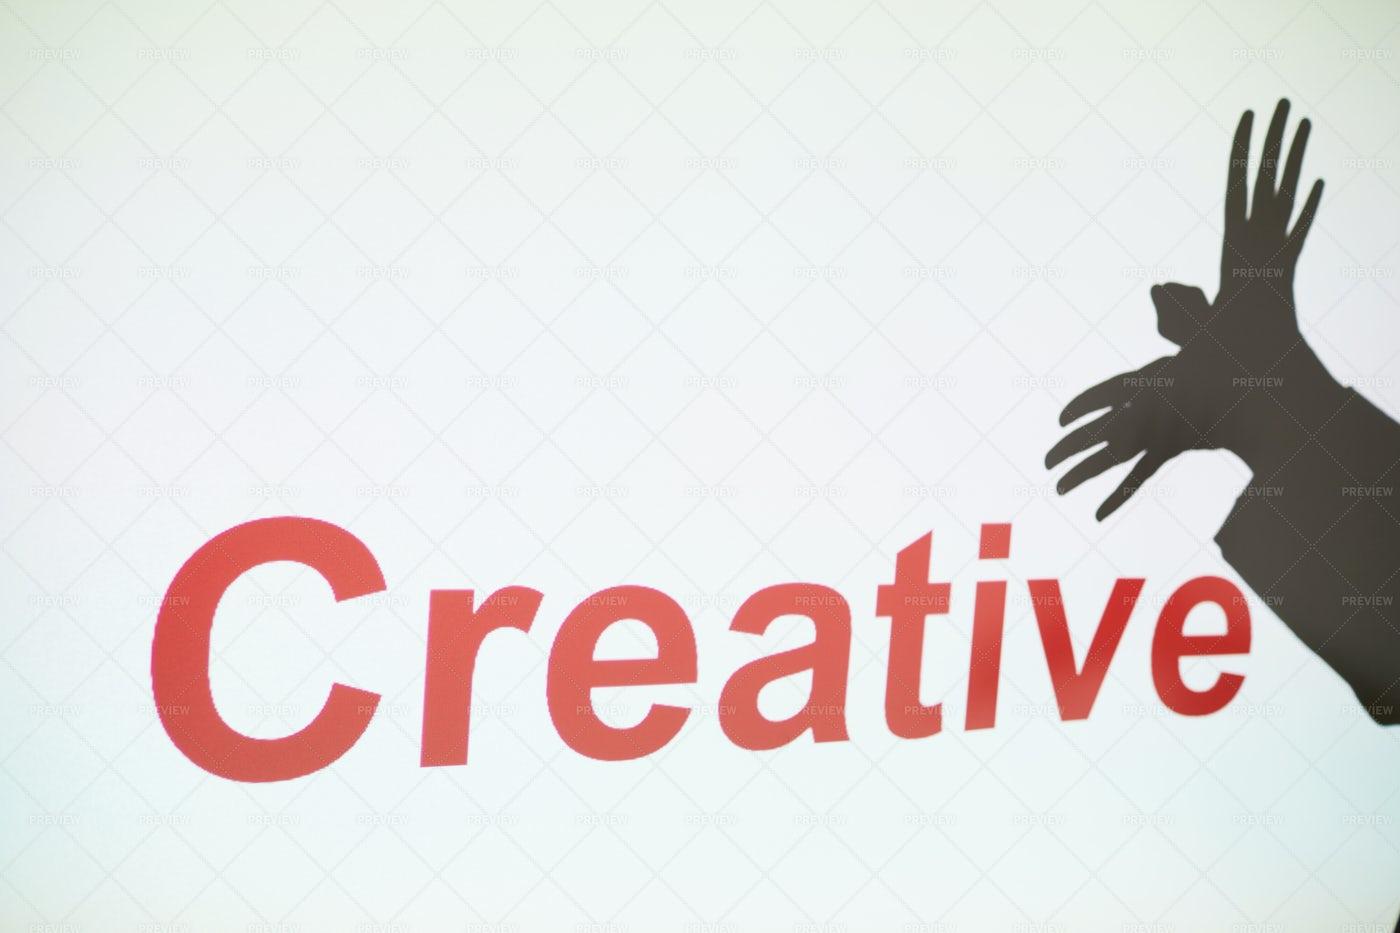 Creative Idea For Project: Stock Photos